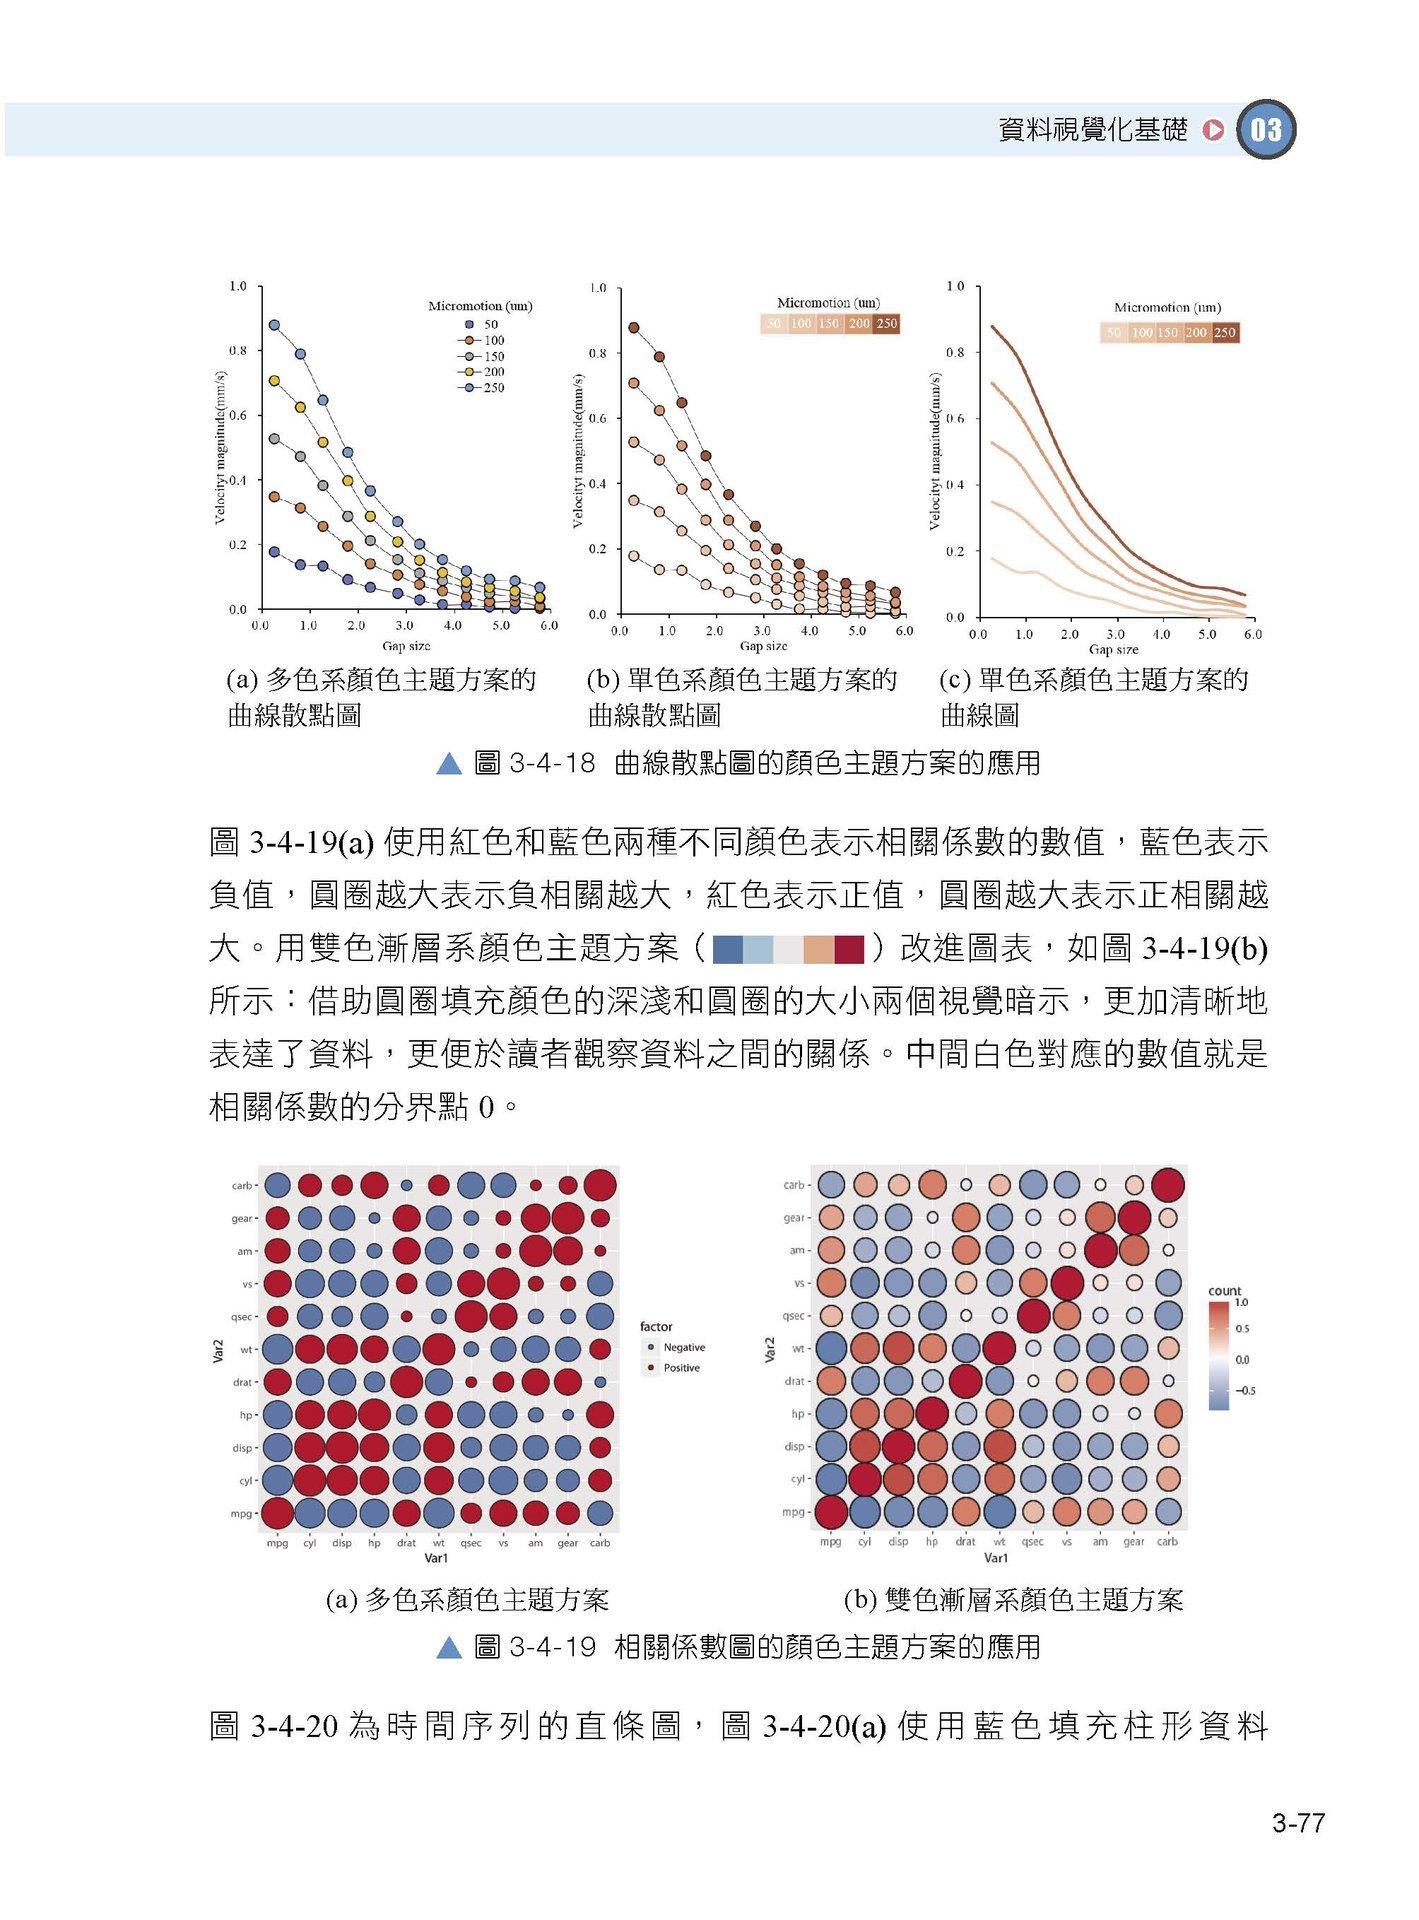 Python 資料可視化之美:極專業圖表製作高手書 (全彩印刷)-preview-9